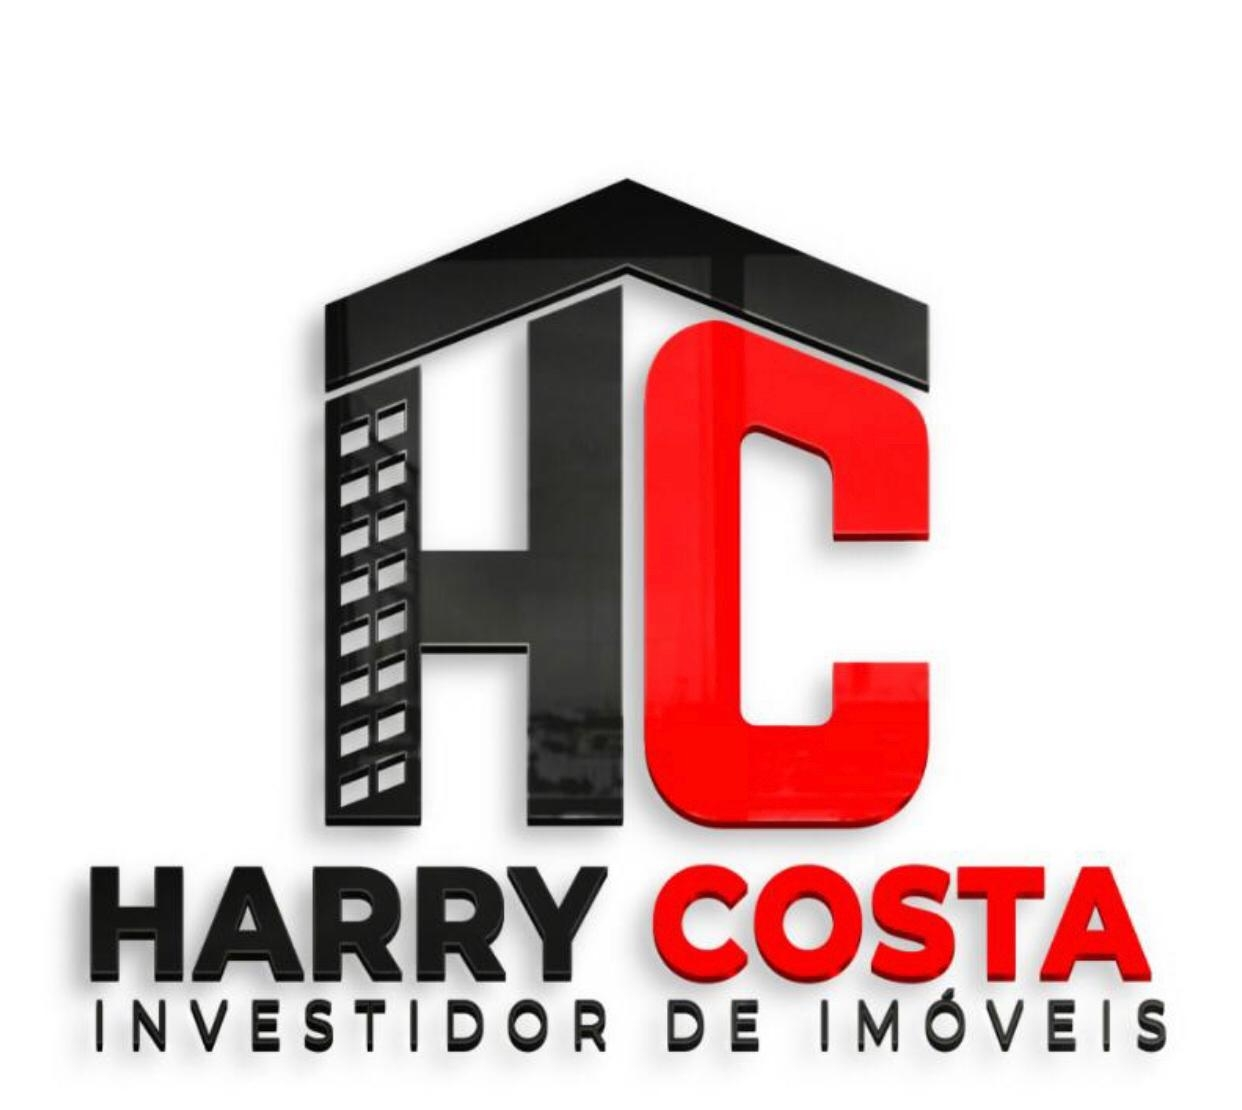 HARRY COSTA INVESTIDOR DE IMÓVEIS